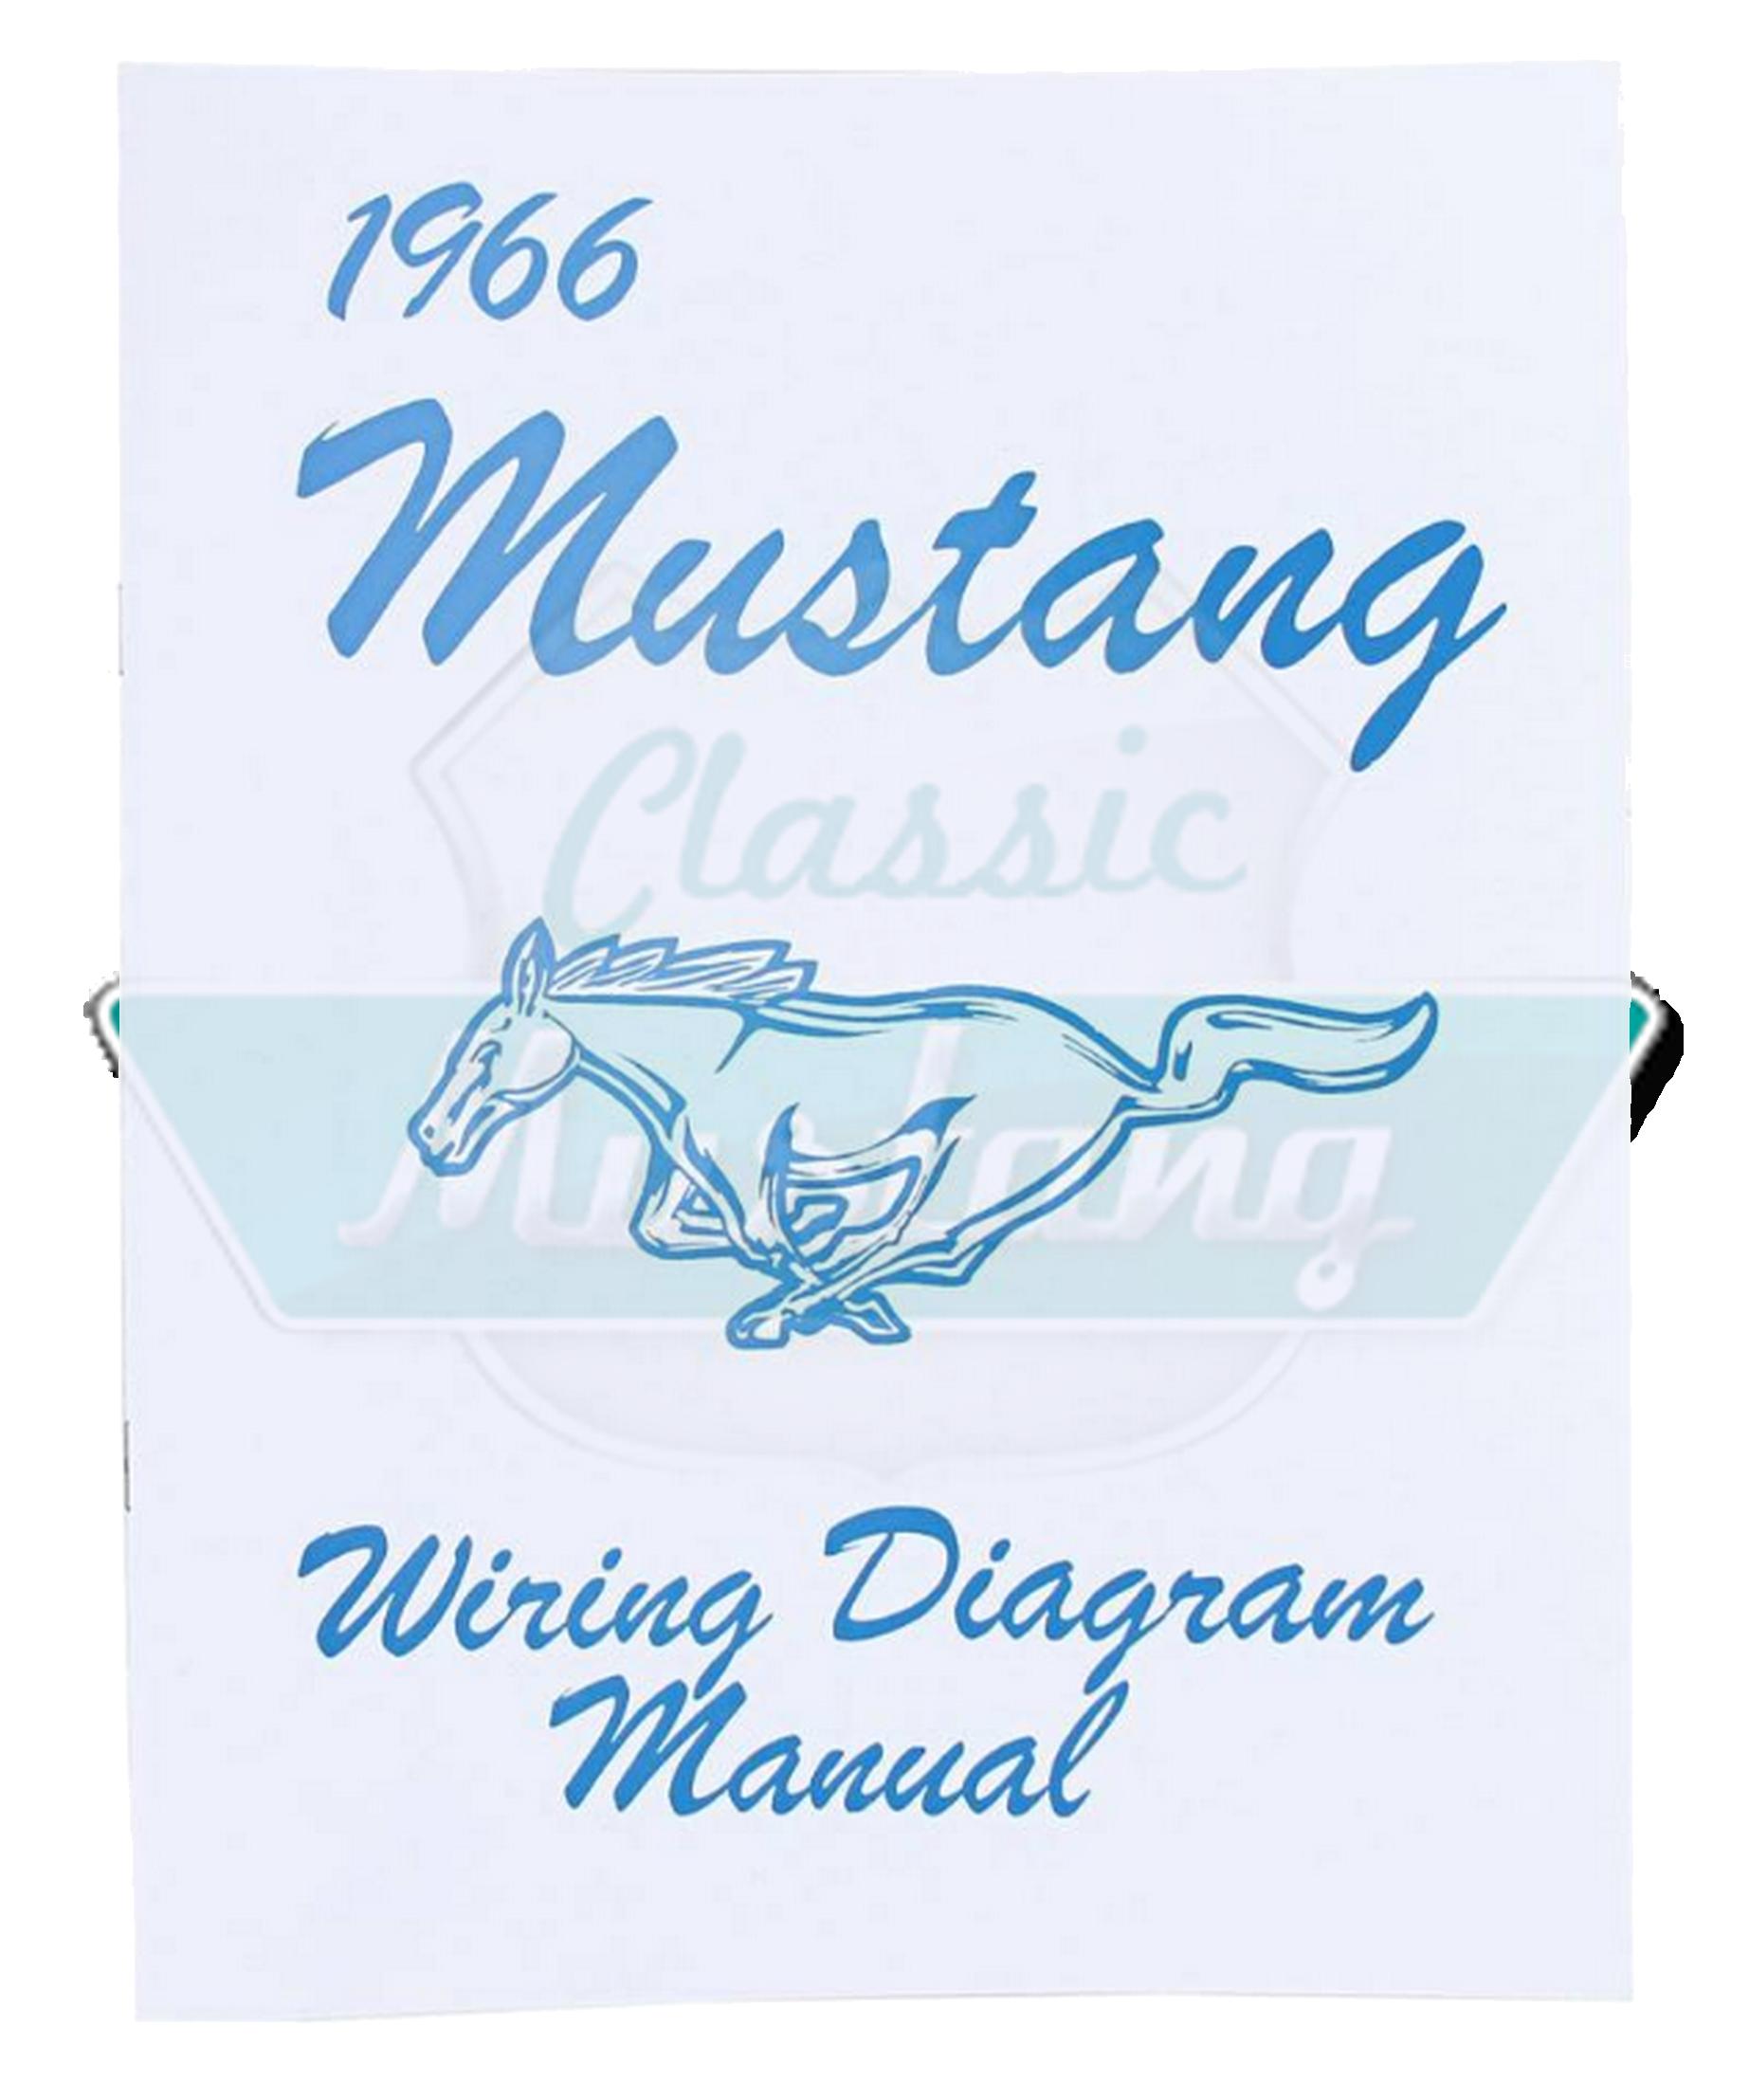 1966 mustang diagram: manuel de c�blage ford mustang 1966 92-003 :  classic